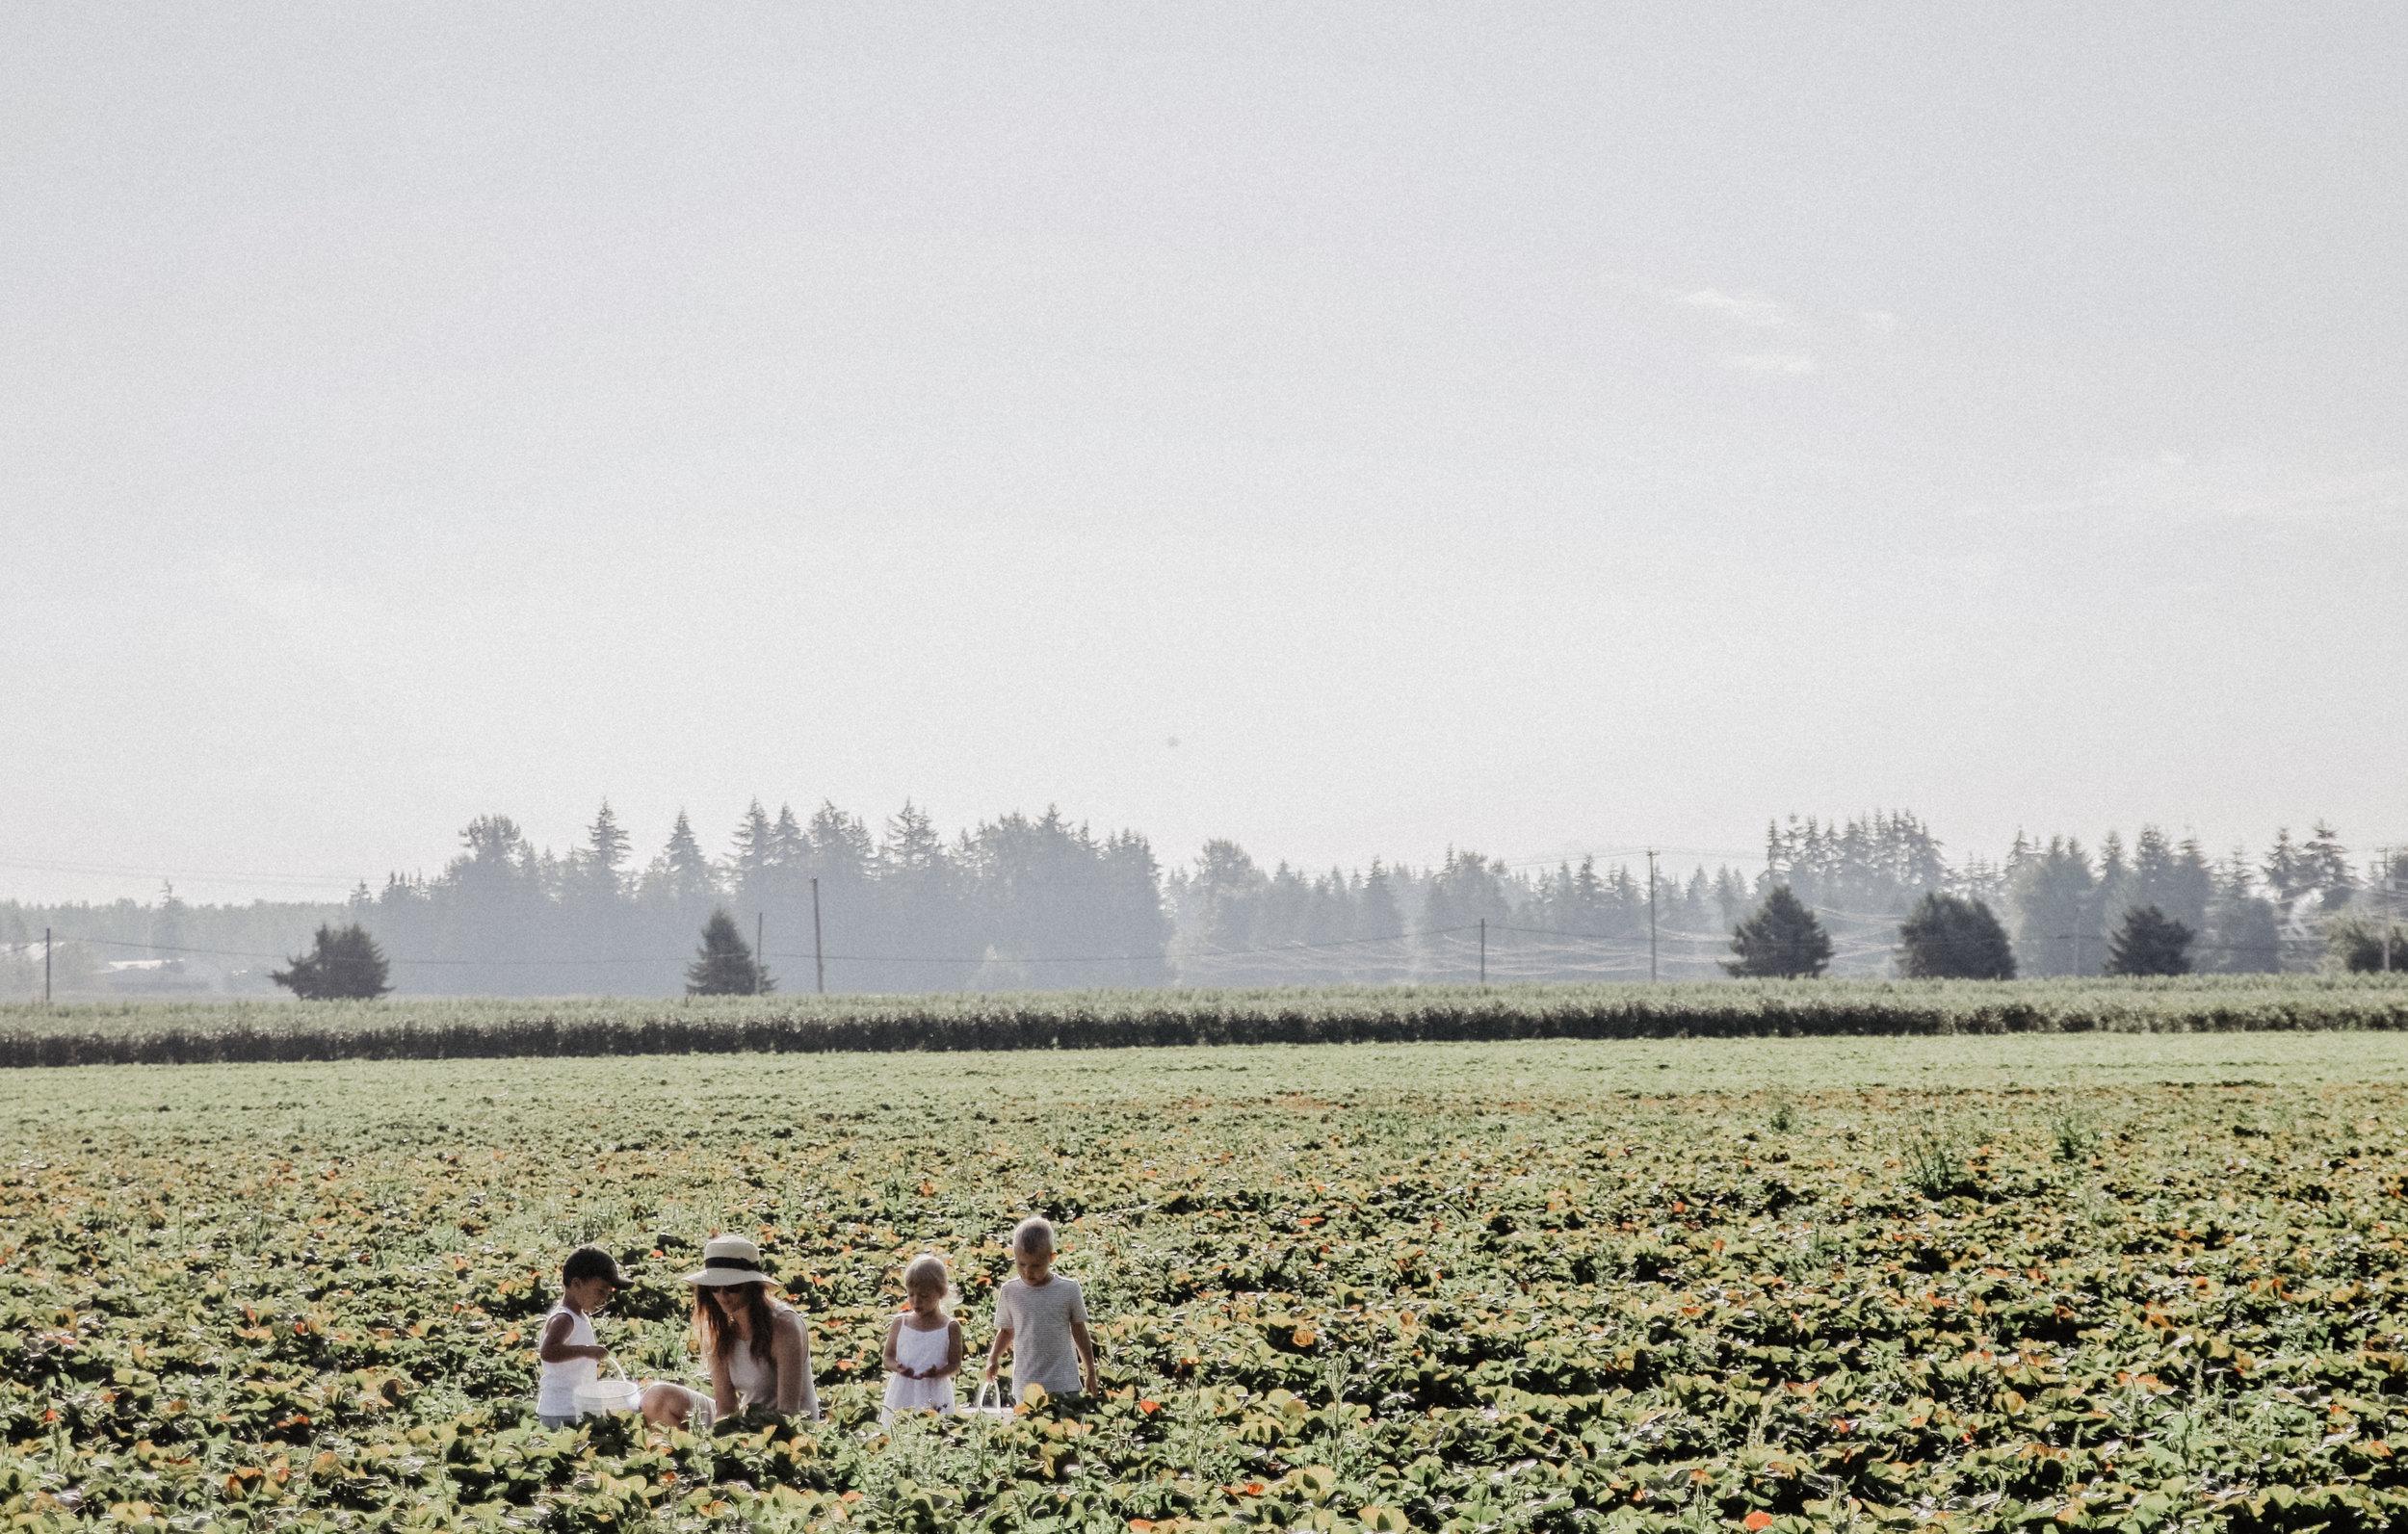 Driediger farms-3.jpg